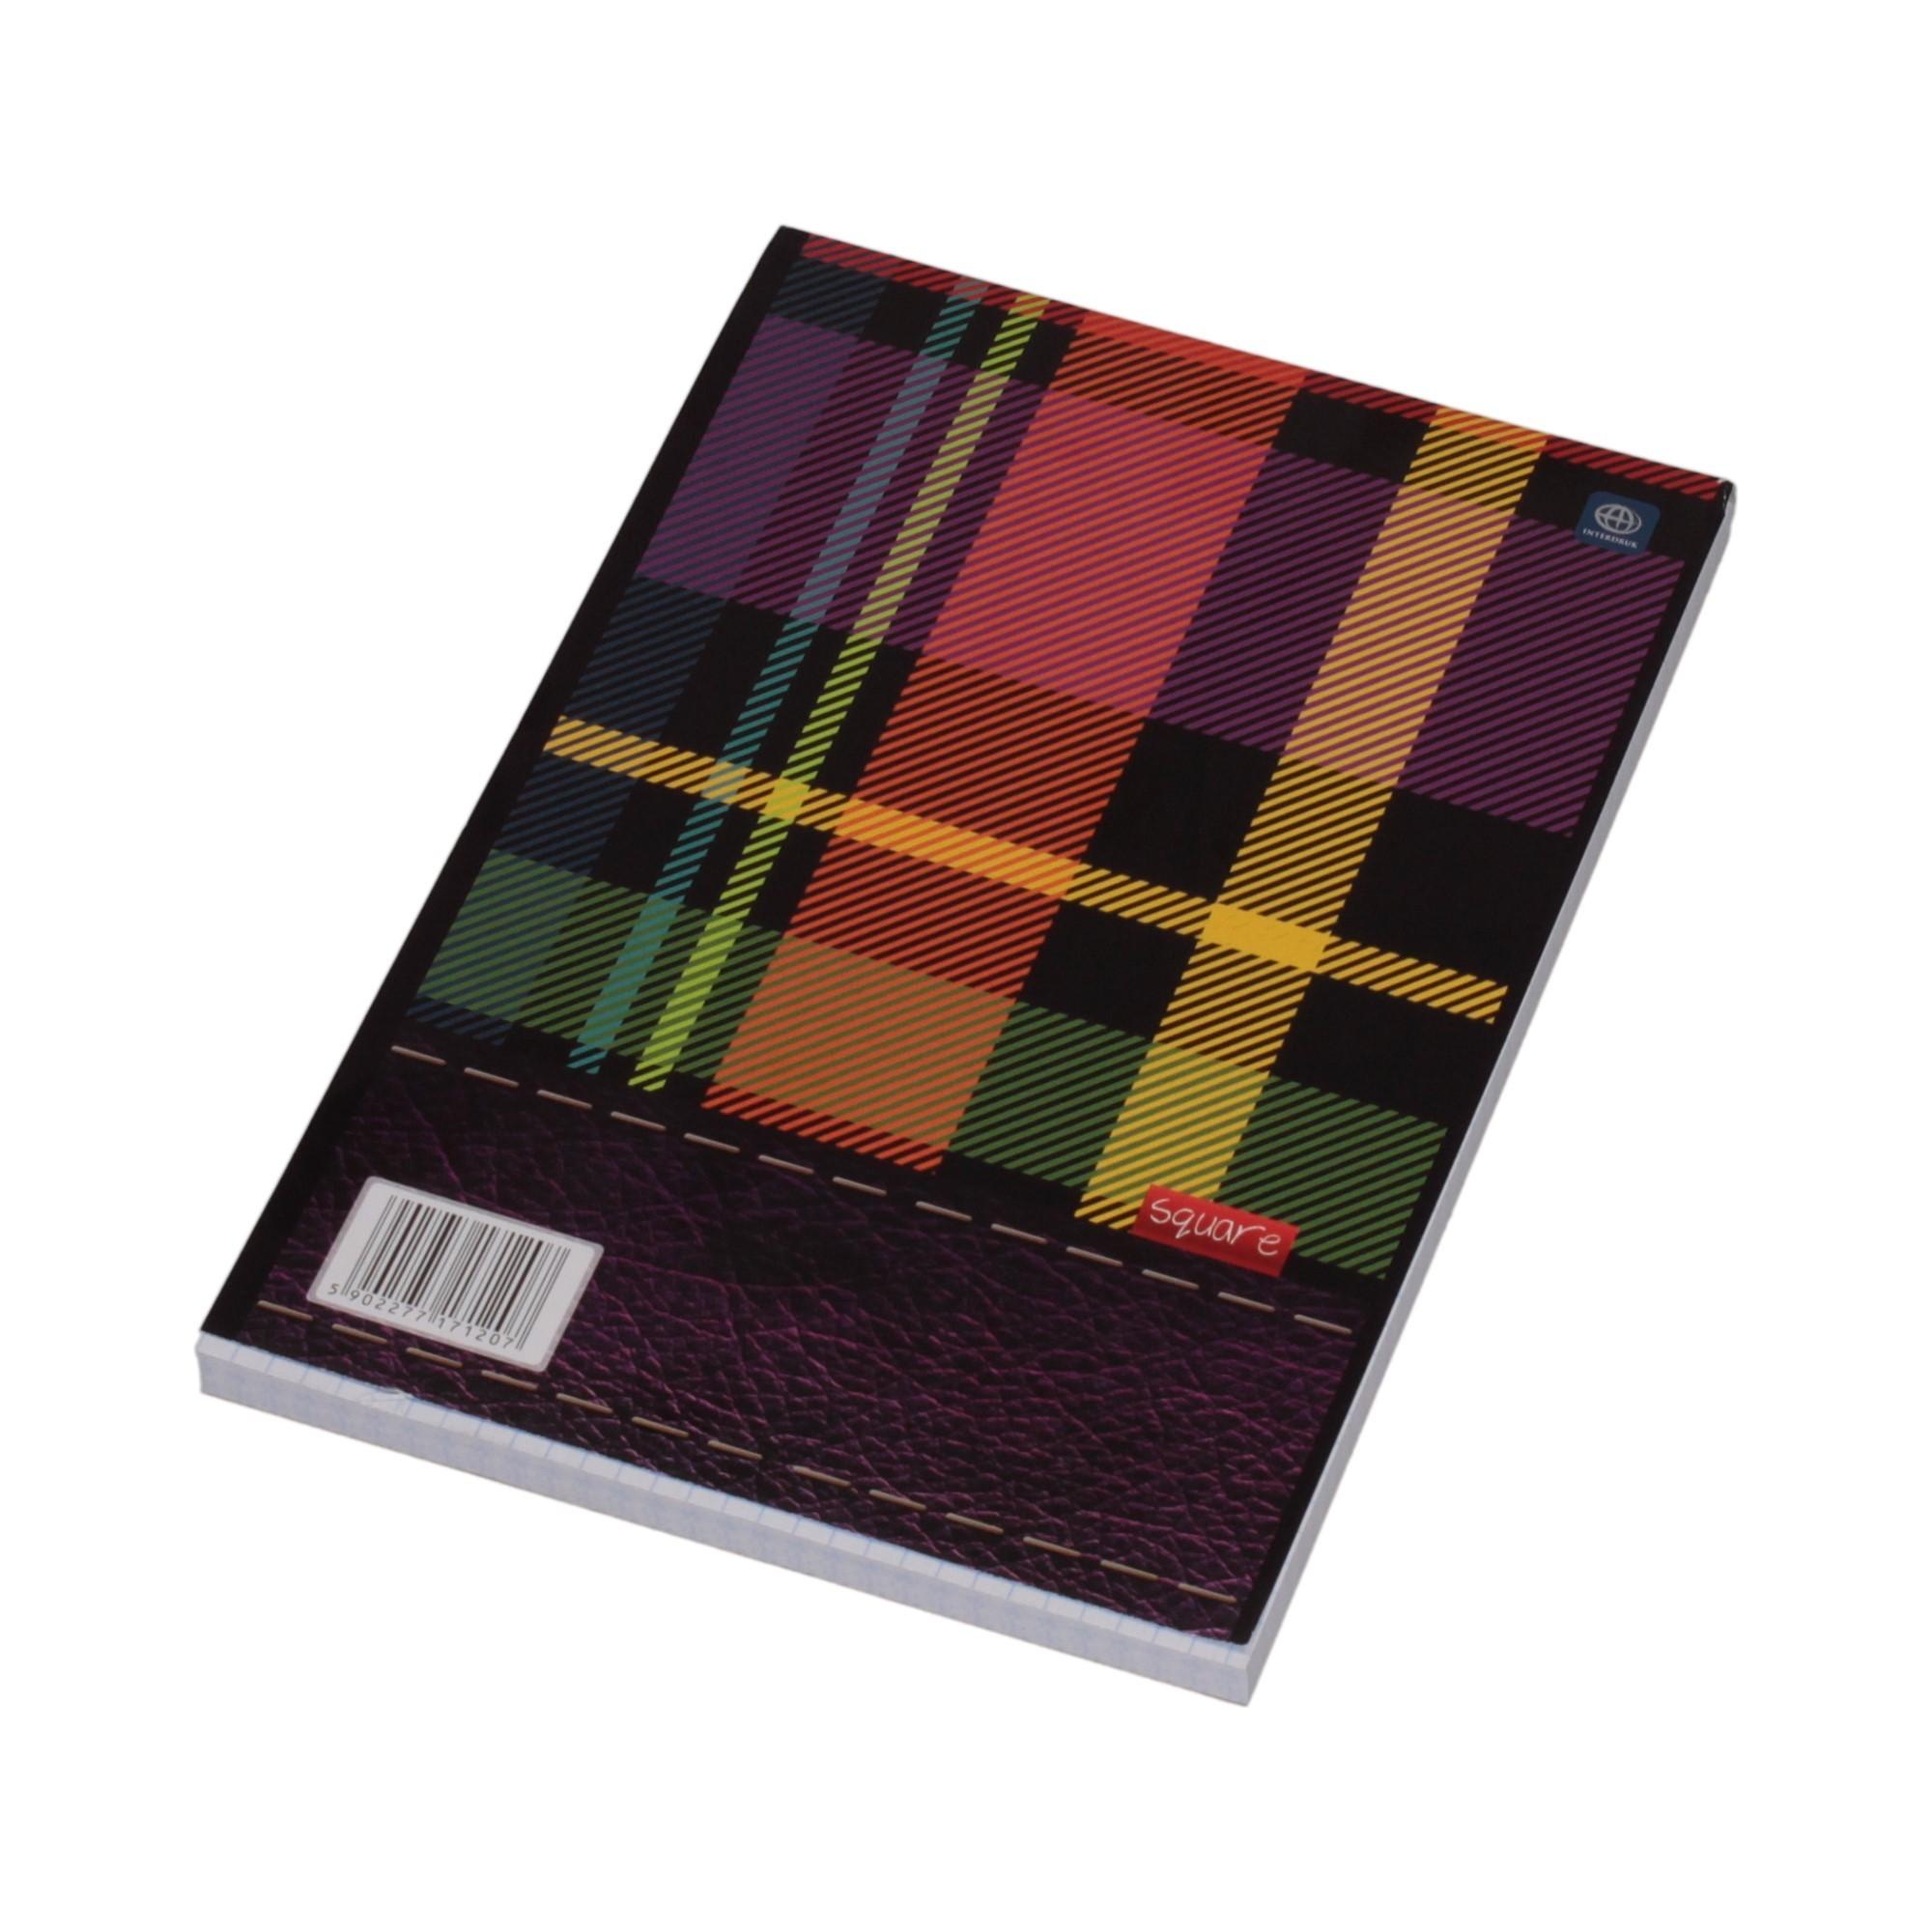 Blok notatnikowy A5/100 kratka Interdruk